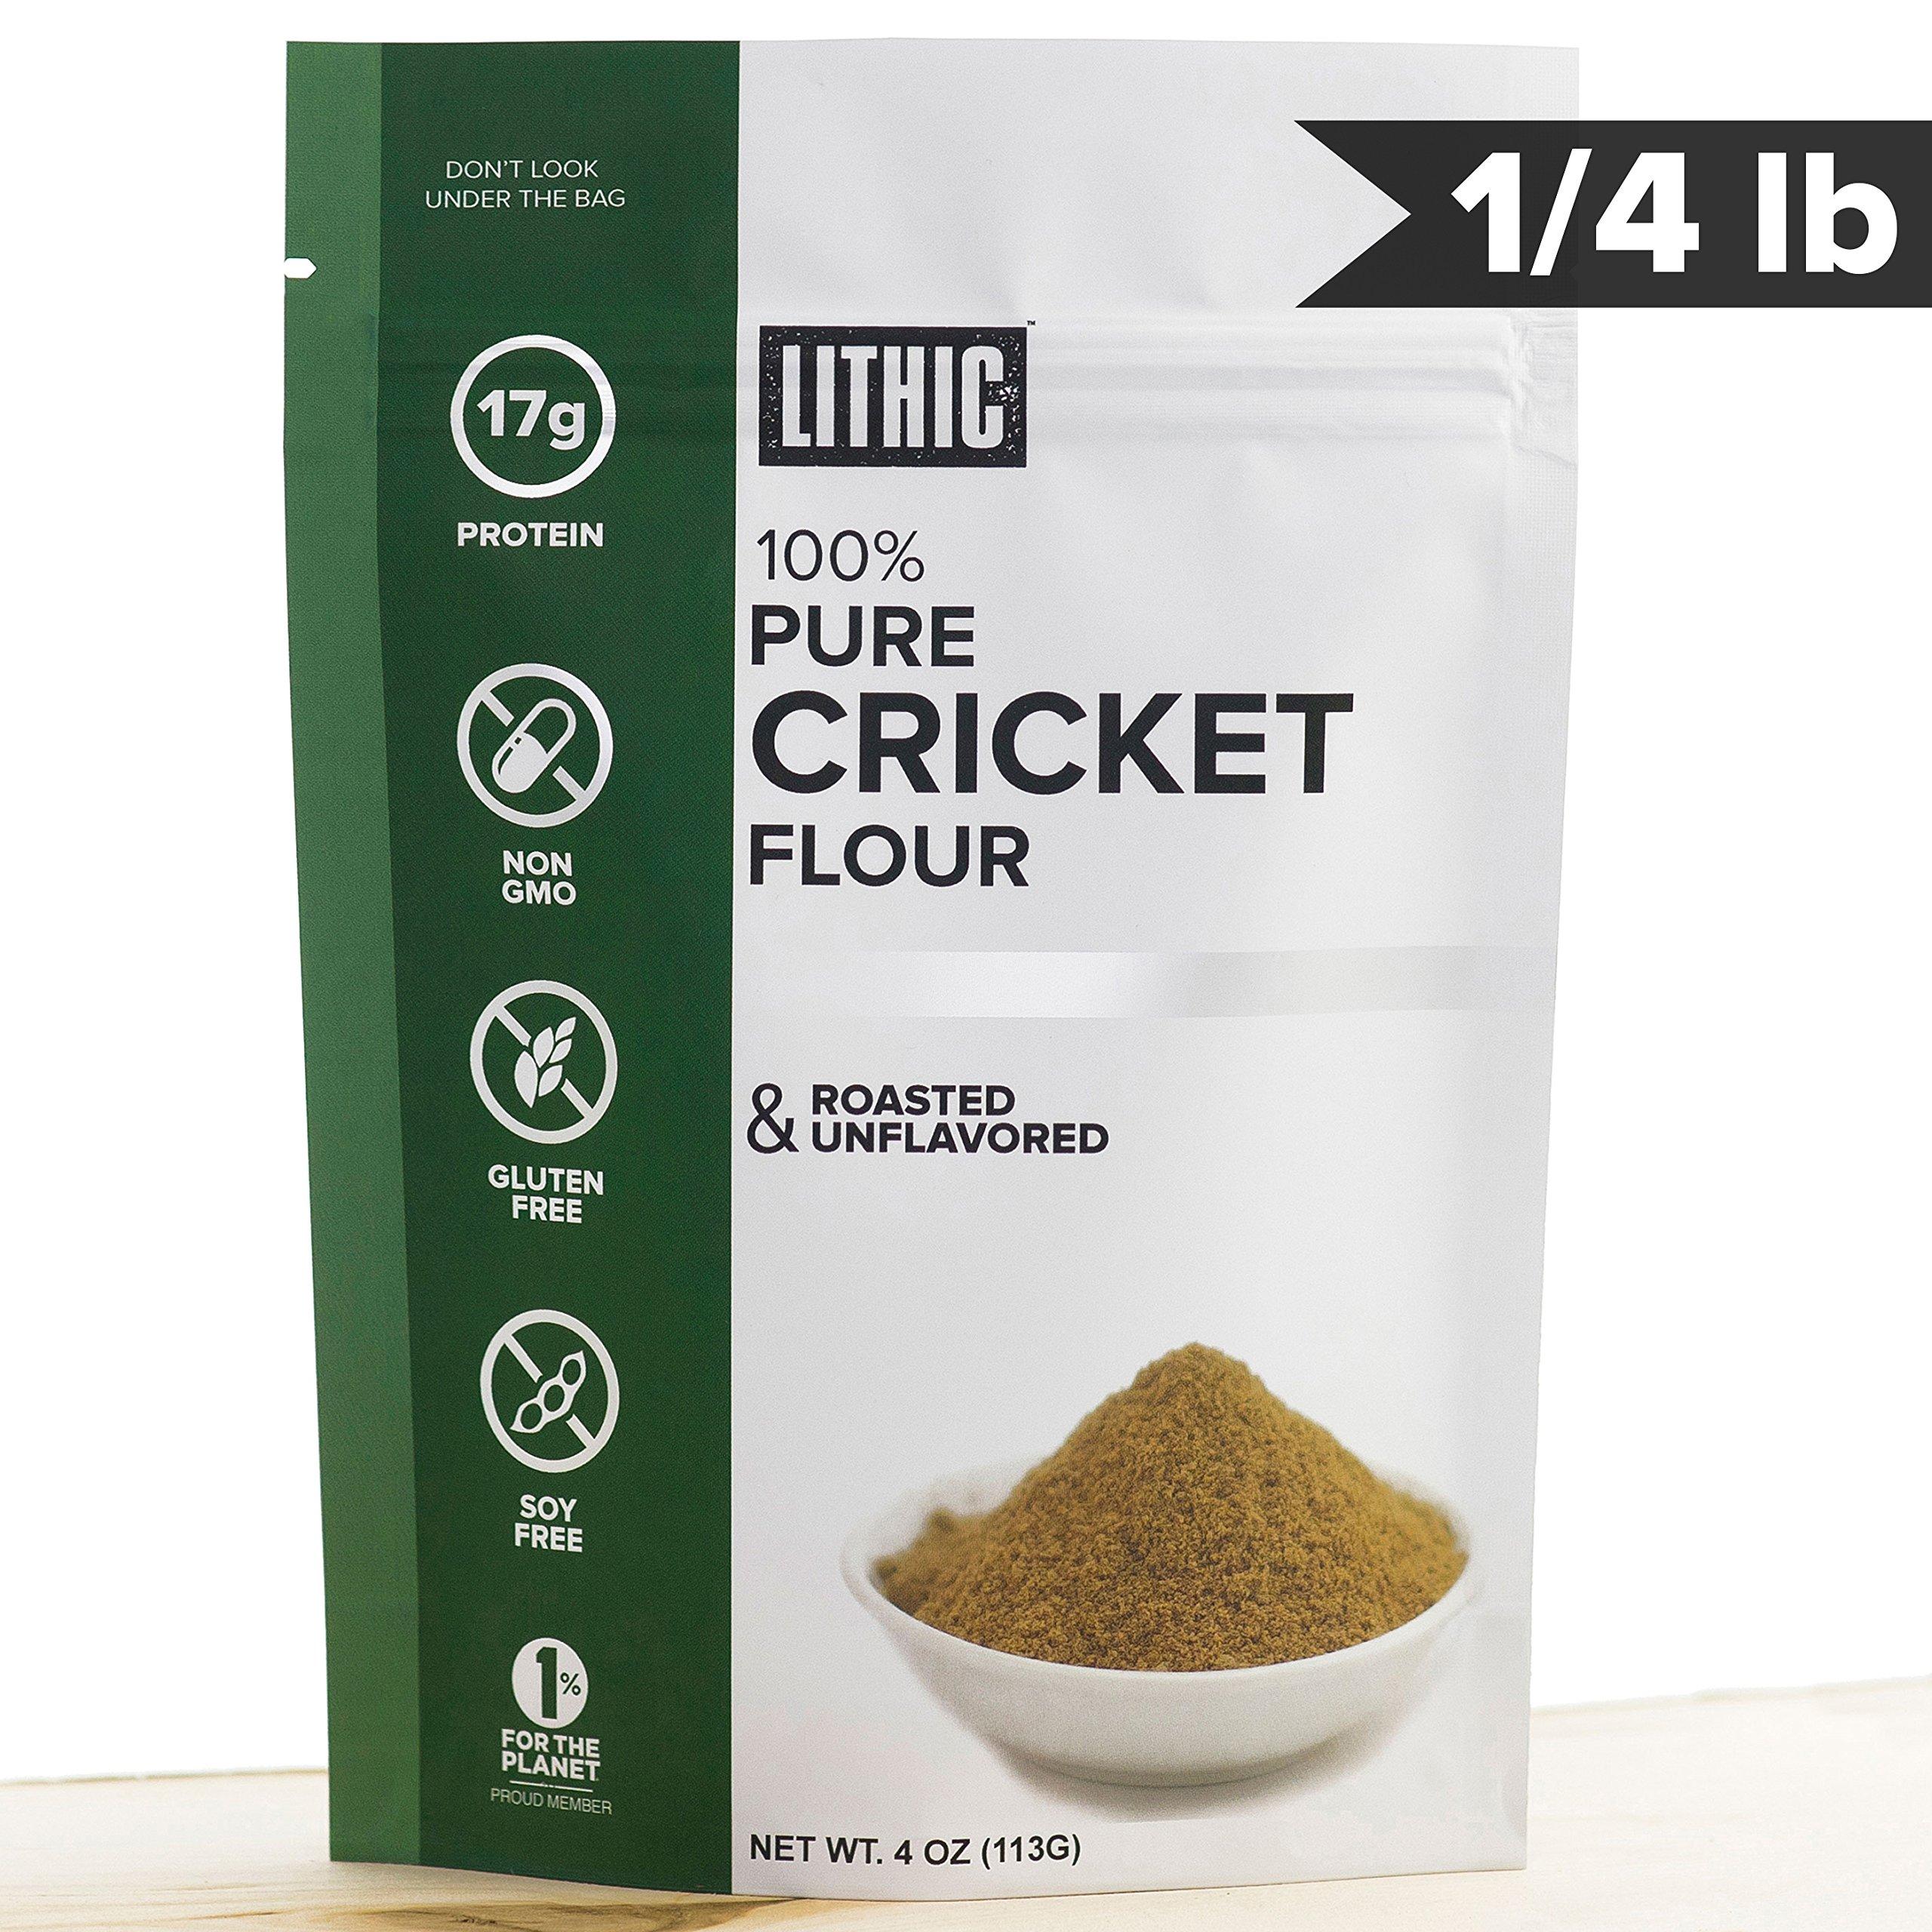 Cricket Flour, Cricket Powder :: 1/4LB (113g) :: Keto Flour :: Paleo Flour :: Sustainable Food :: Whole 30 Friendly :: Gluten Free Flour :: TRIAL SIZE :: Lithic Cricket Flour by Lithic Foods